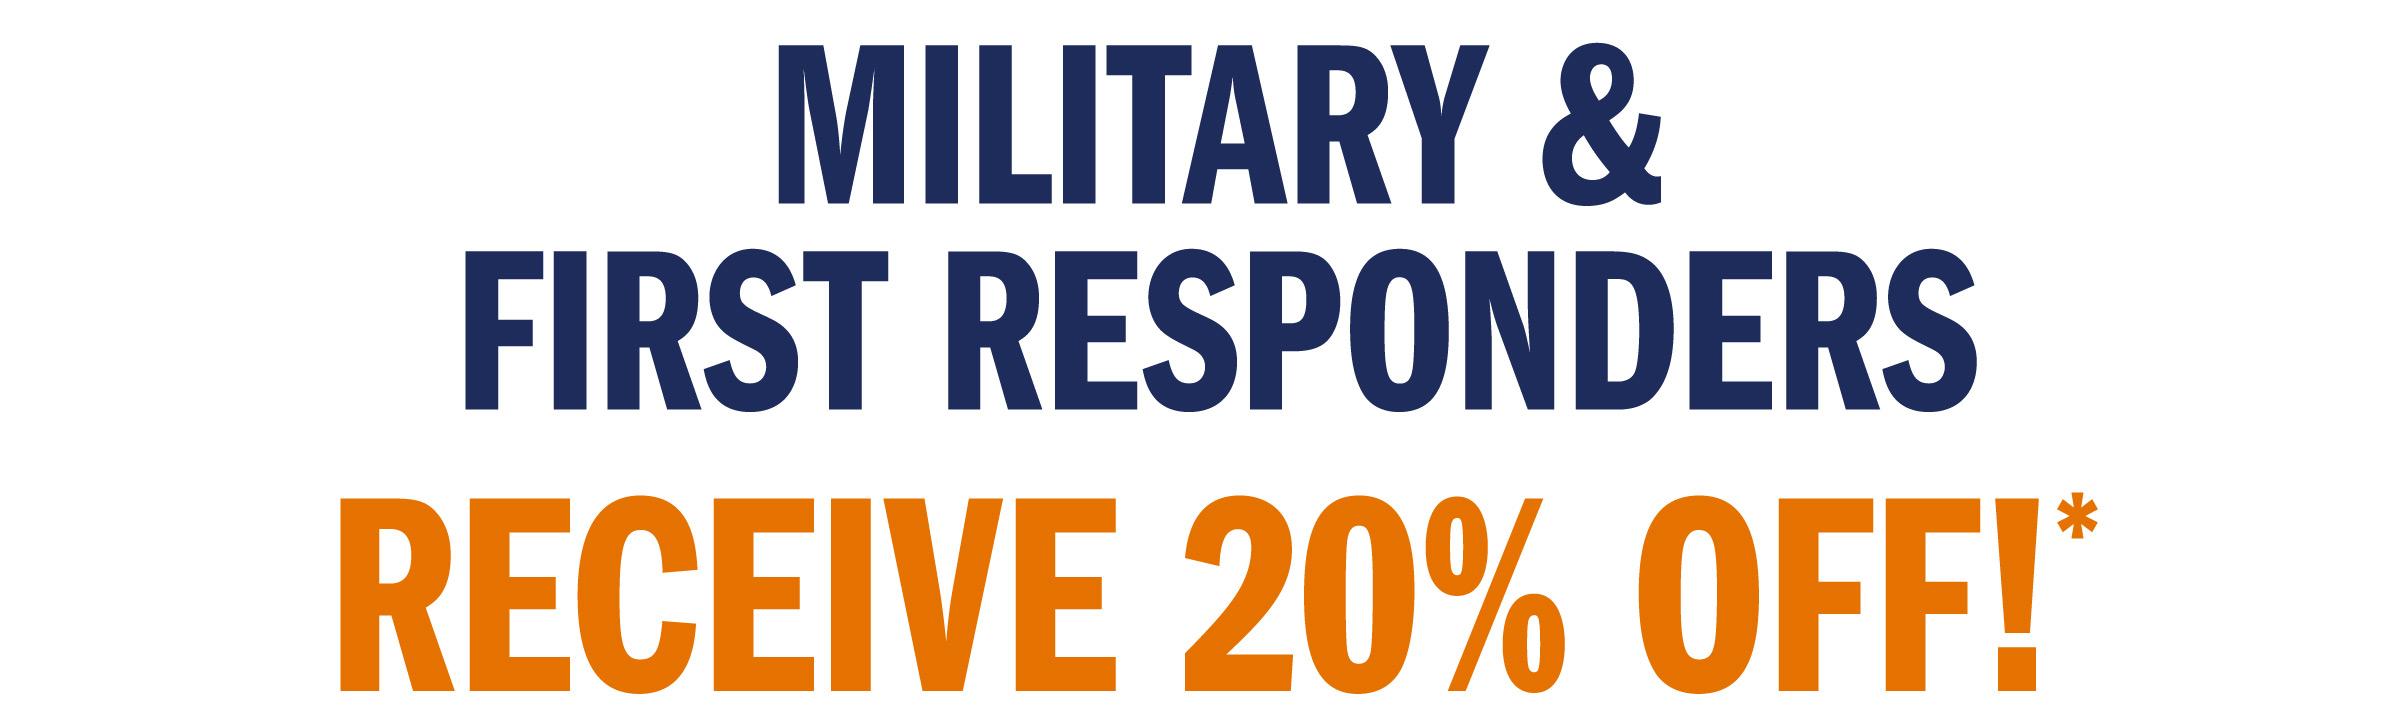 UVA-LASIK-10%-OFF-Graphic-Military-banner.jpg